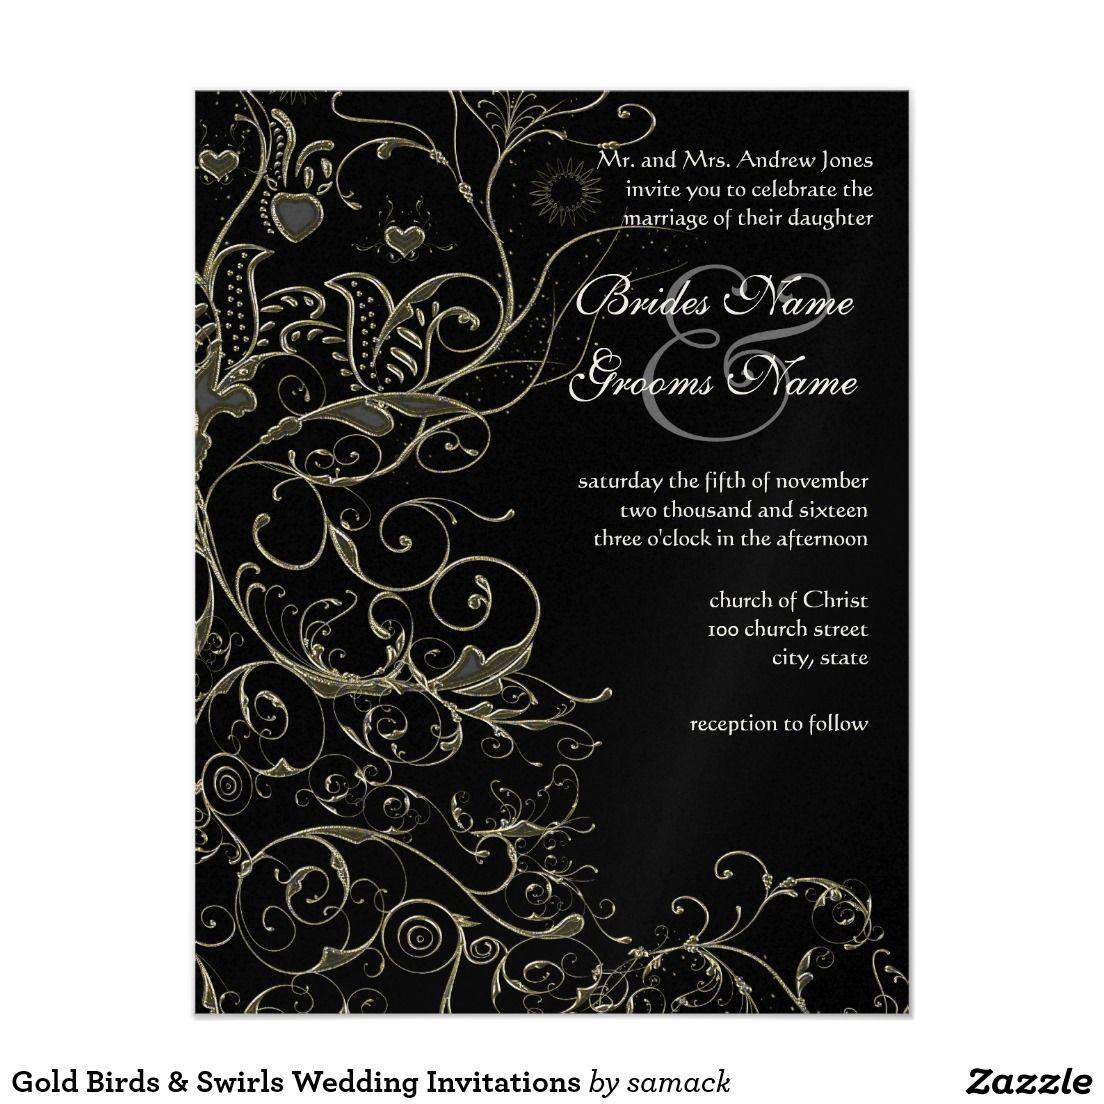 Gold birds swirls wedding invitations weddings gold birds swirls wedding invitations stopboris Images